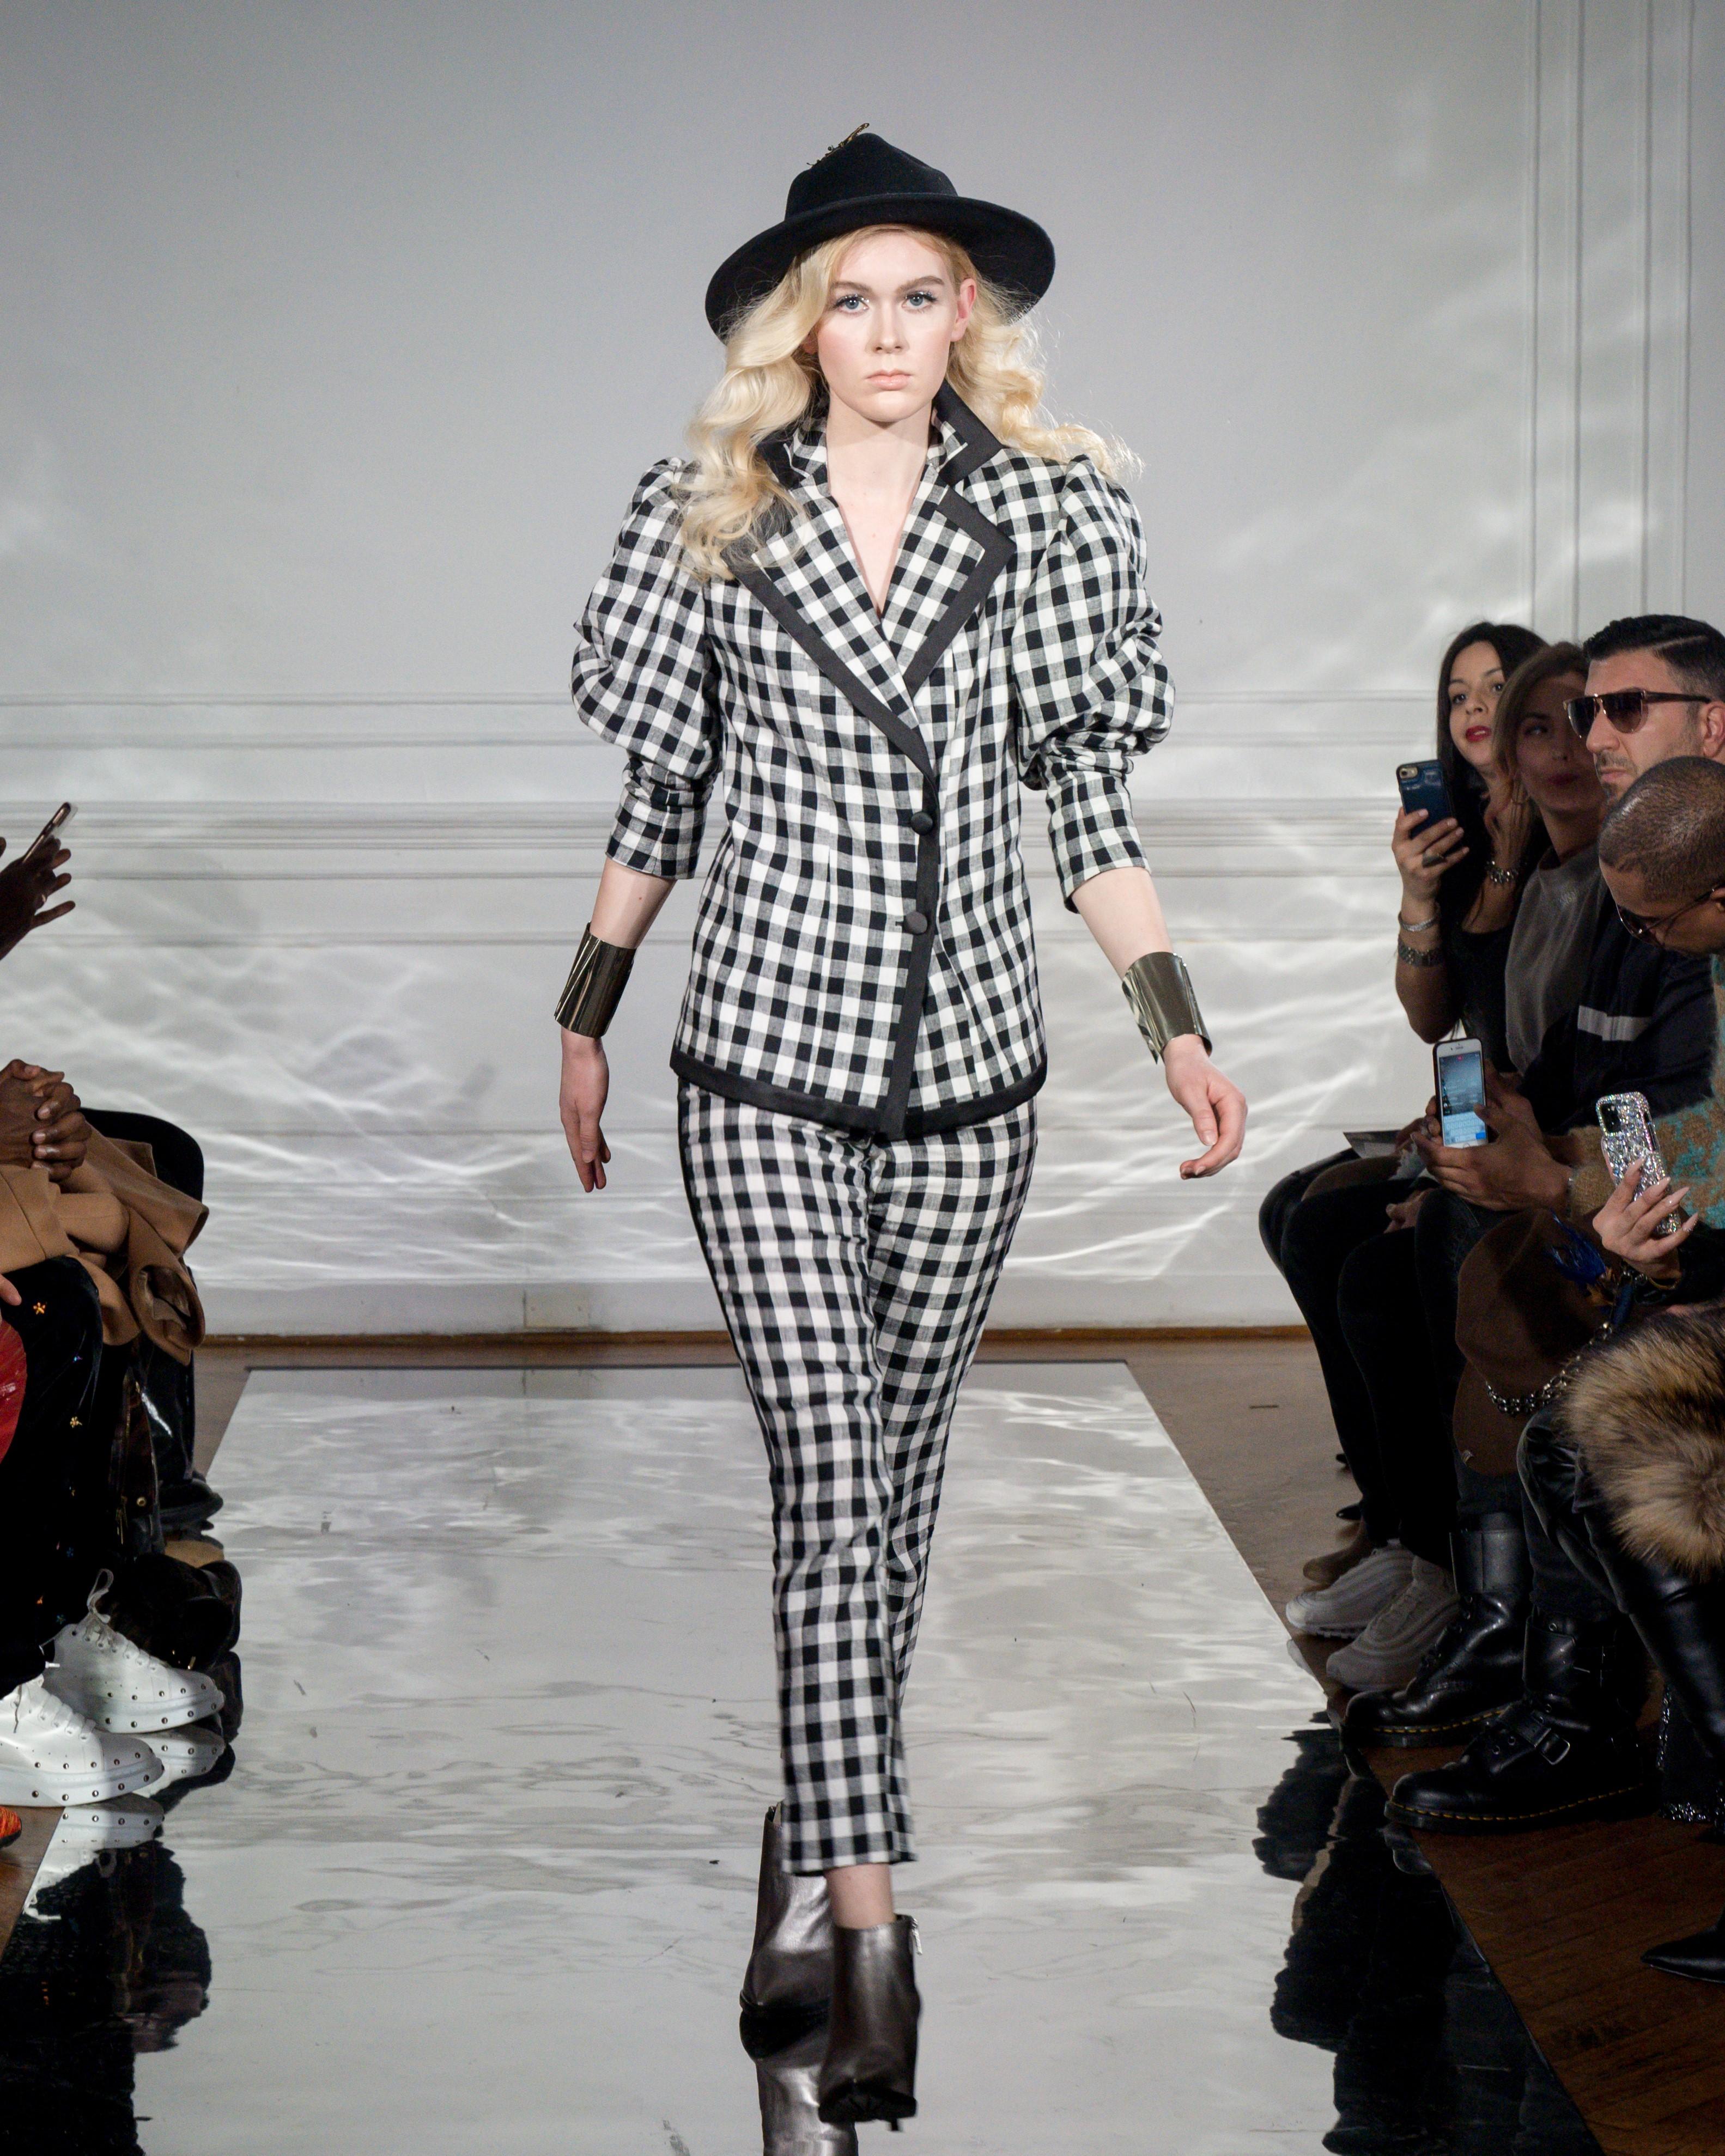 New York Fashion Week: Rossi Tuxedo F/W 2020 by Paola Rossi